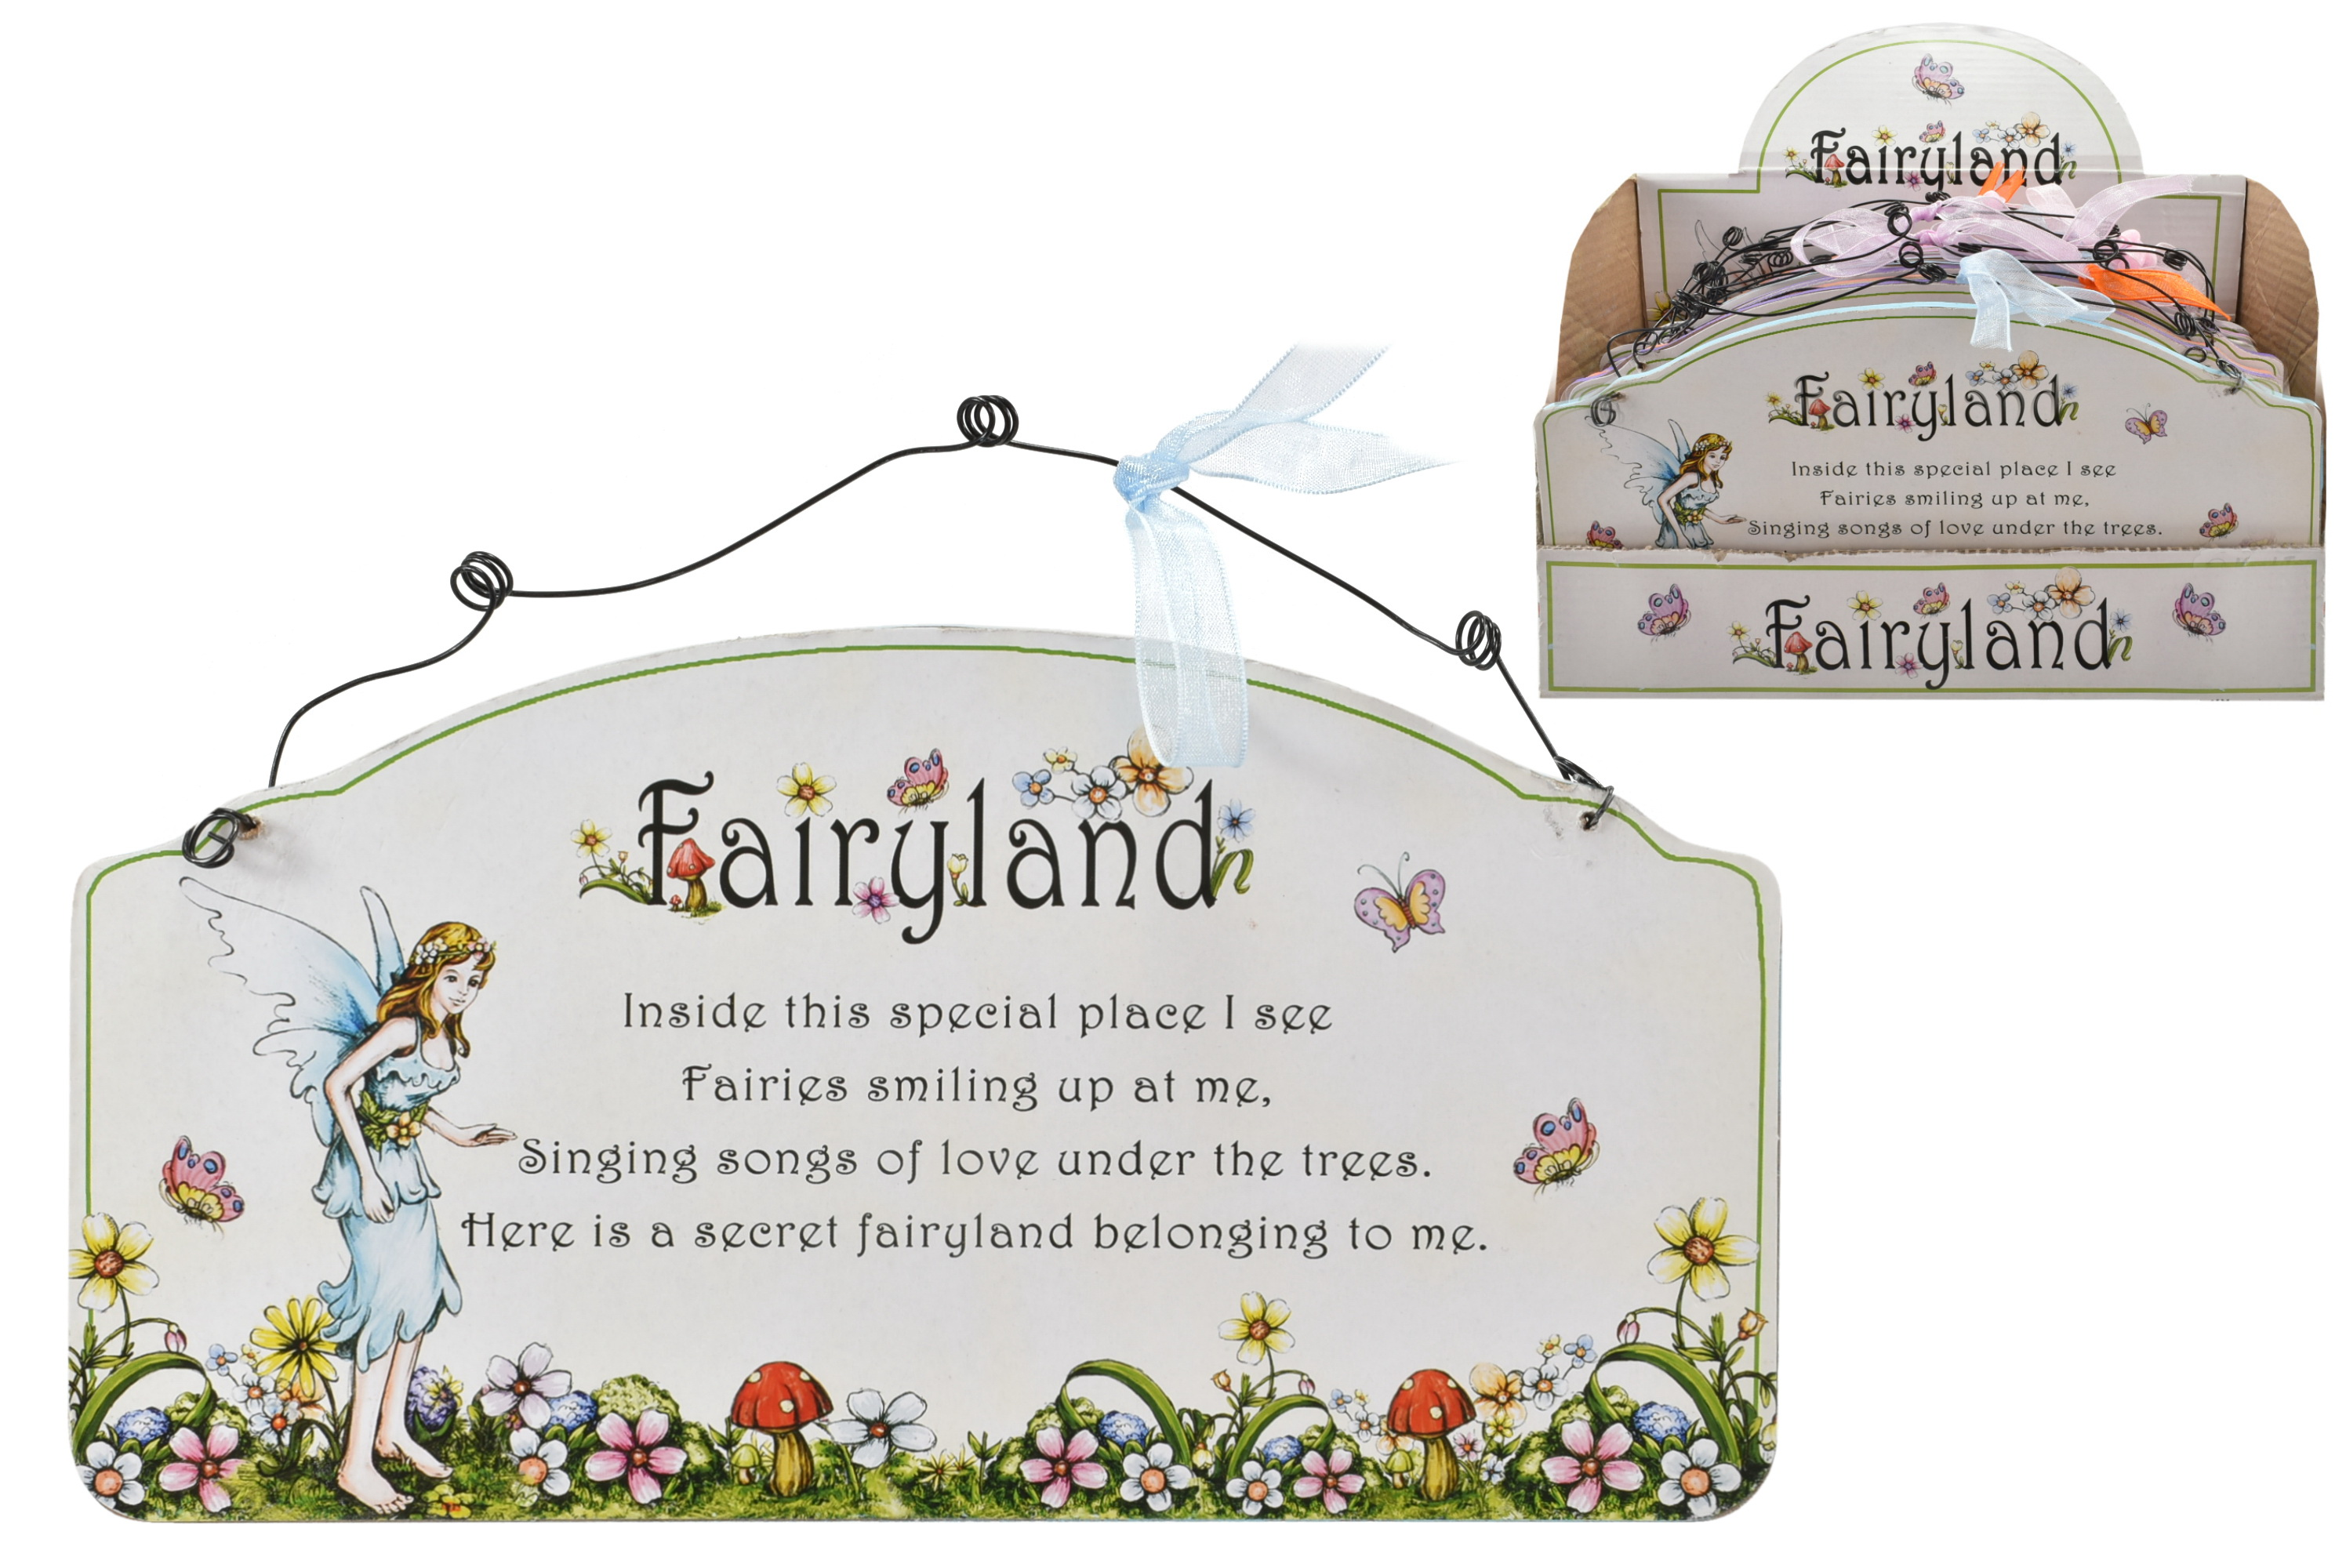 Fairyland Wooden Hanging Wall Plaque - 4 Assorted